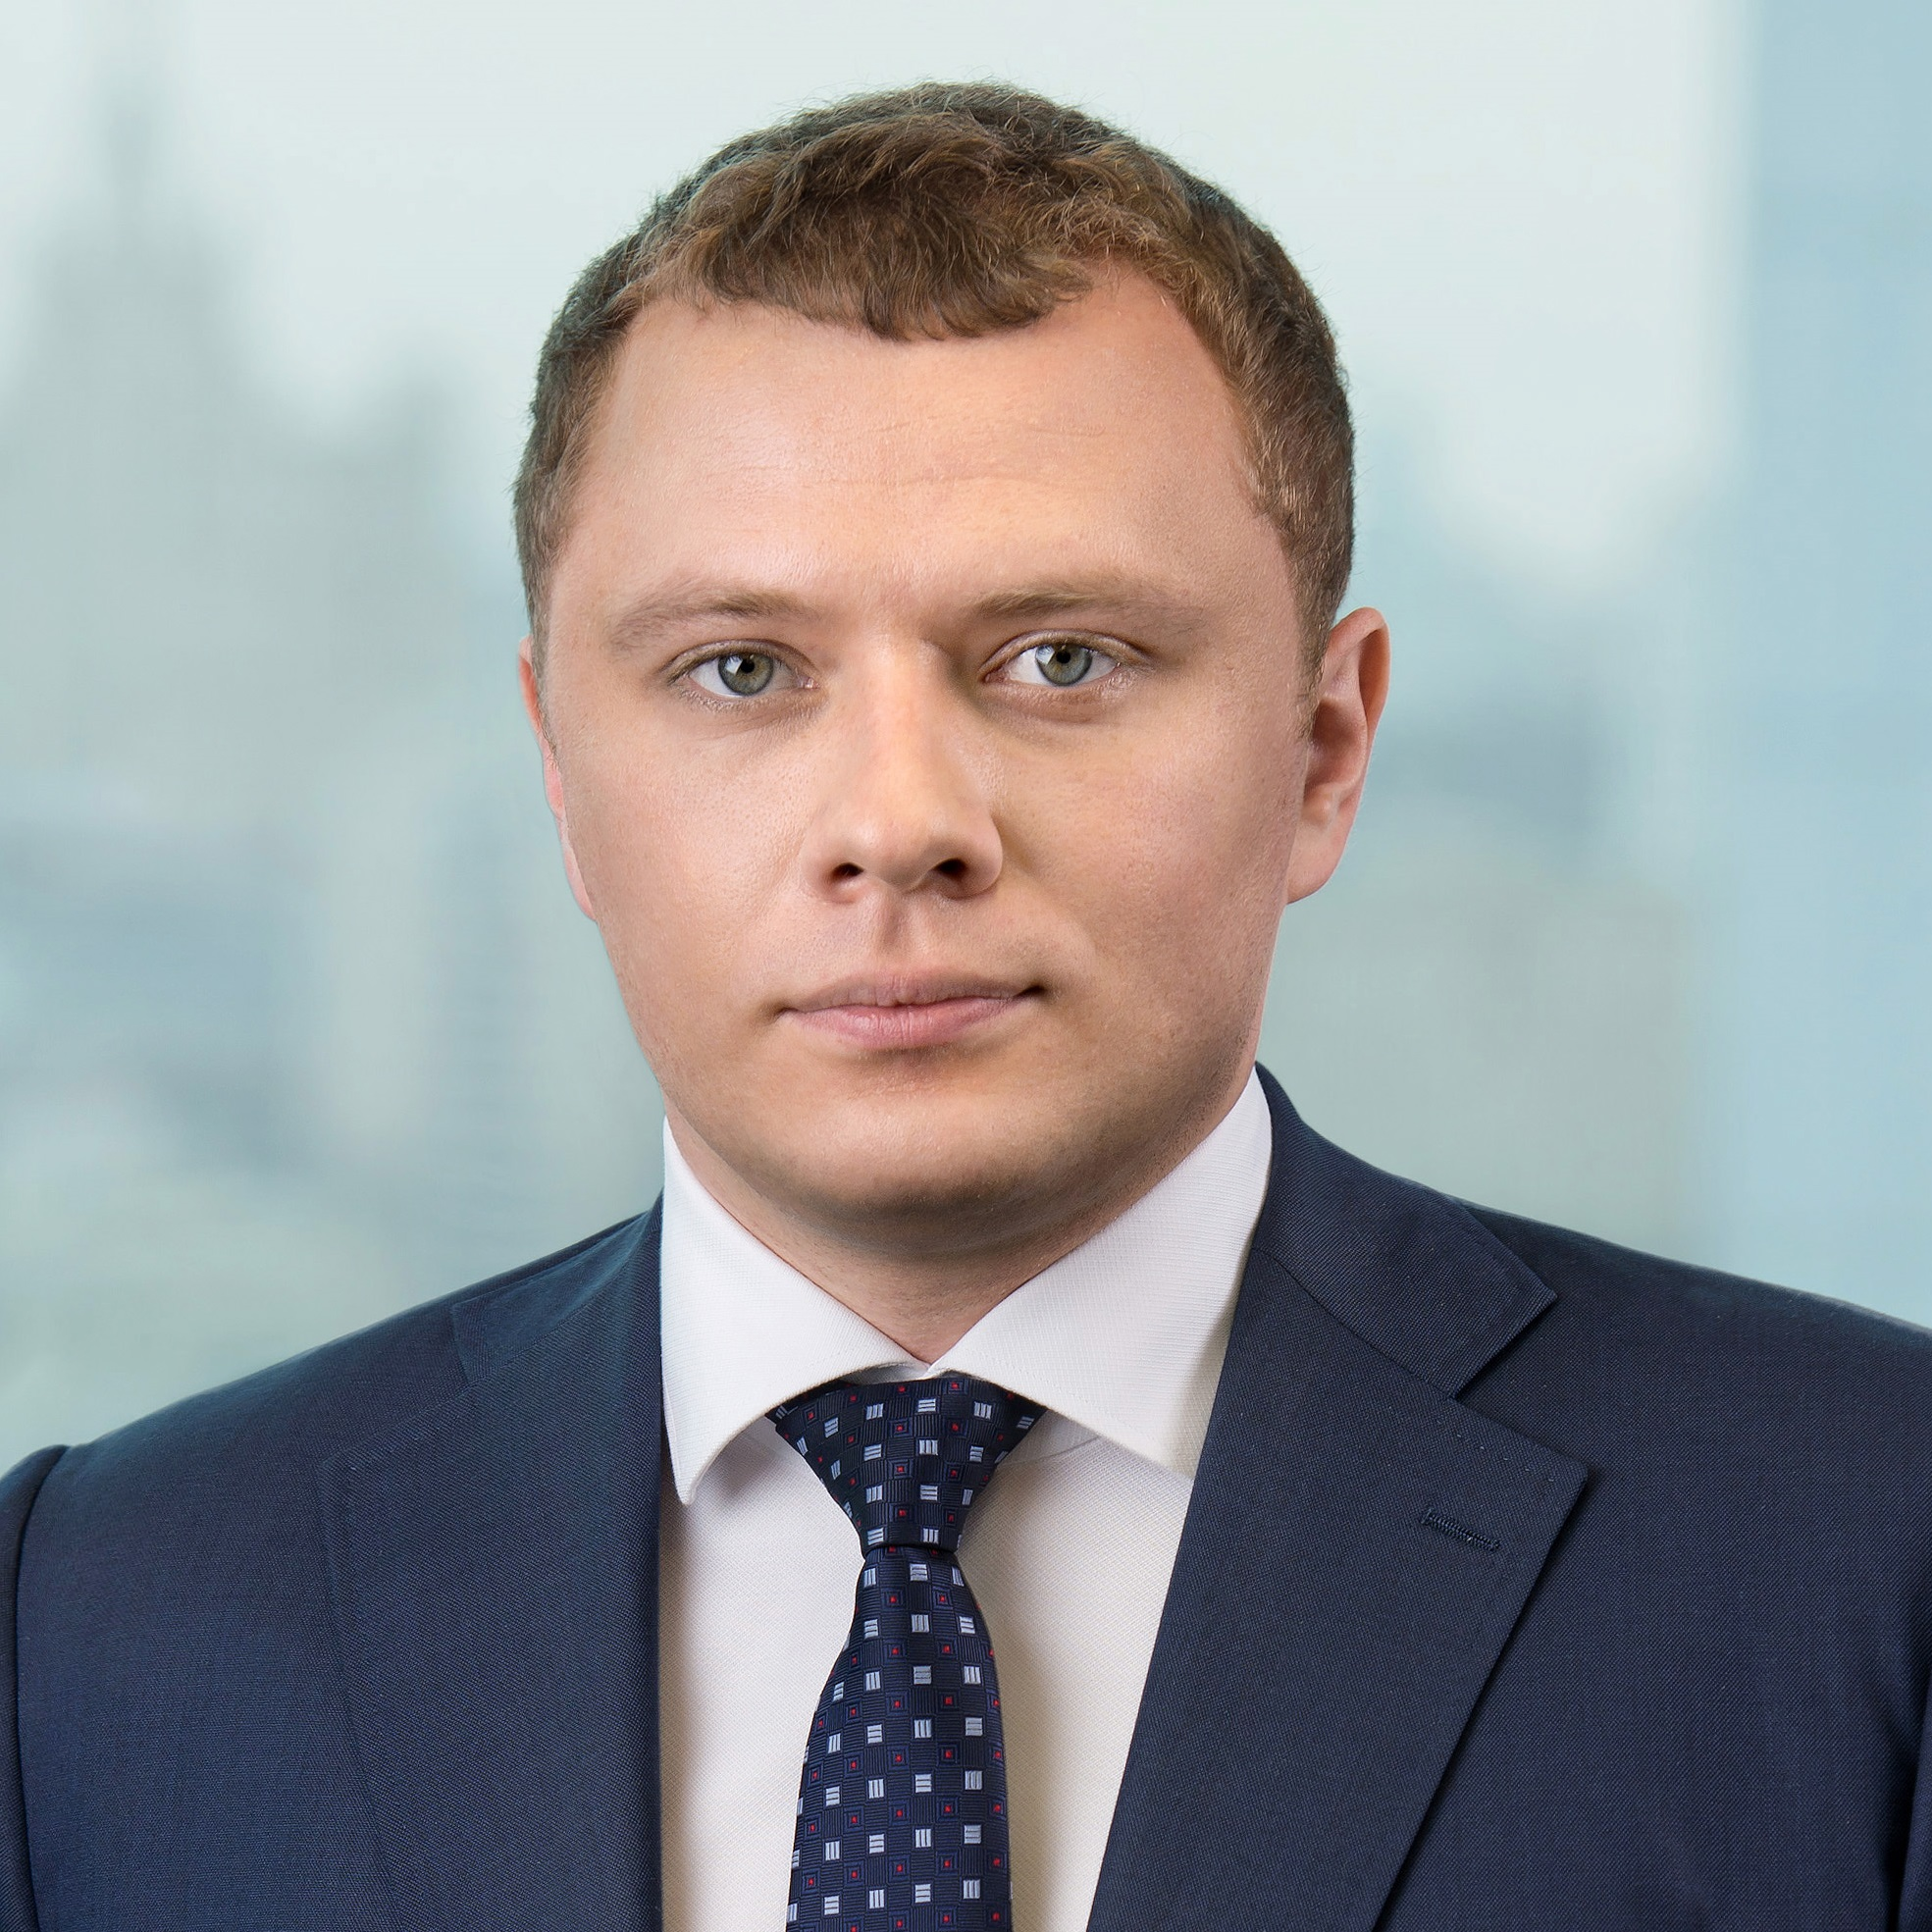 Сергей Лисин